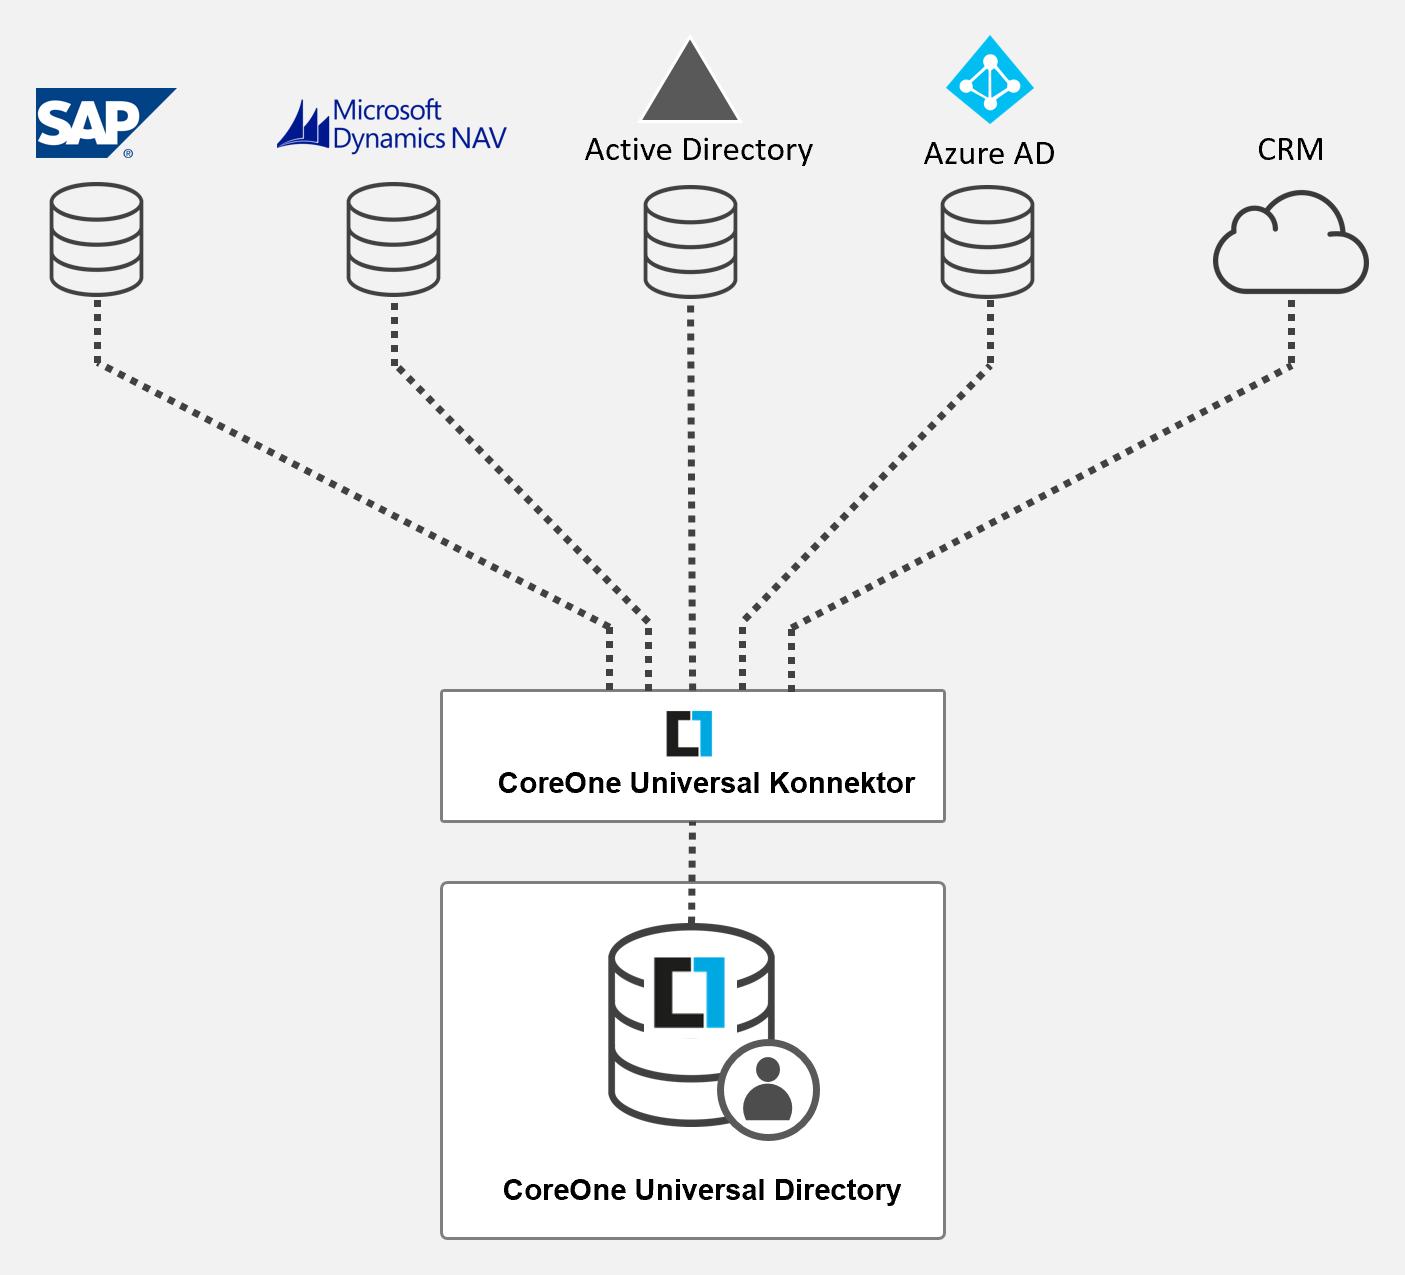 Customer IAM (CIAM) - CoreOne Universal Directory